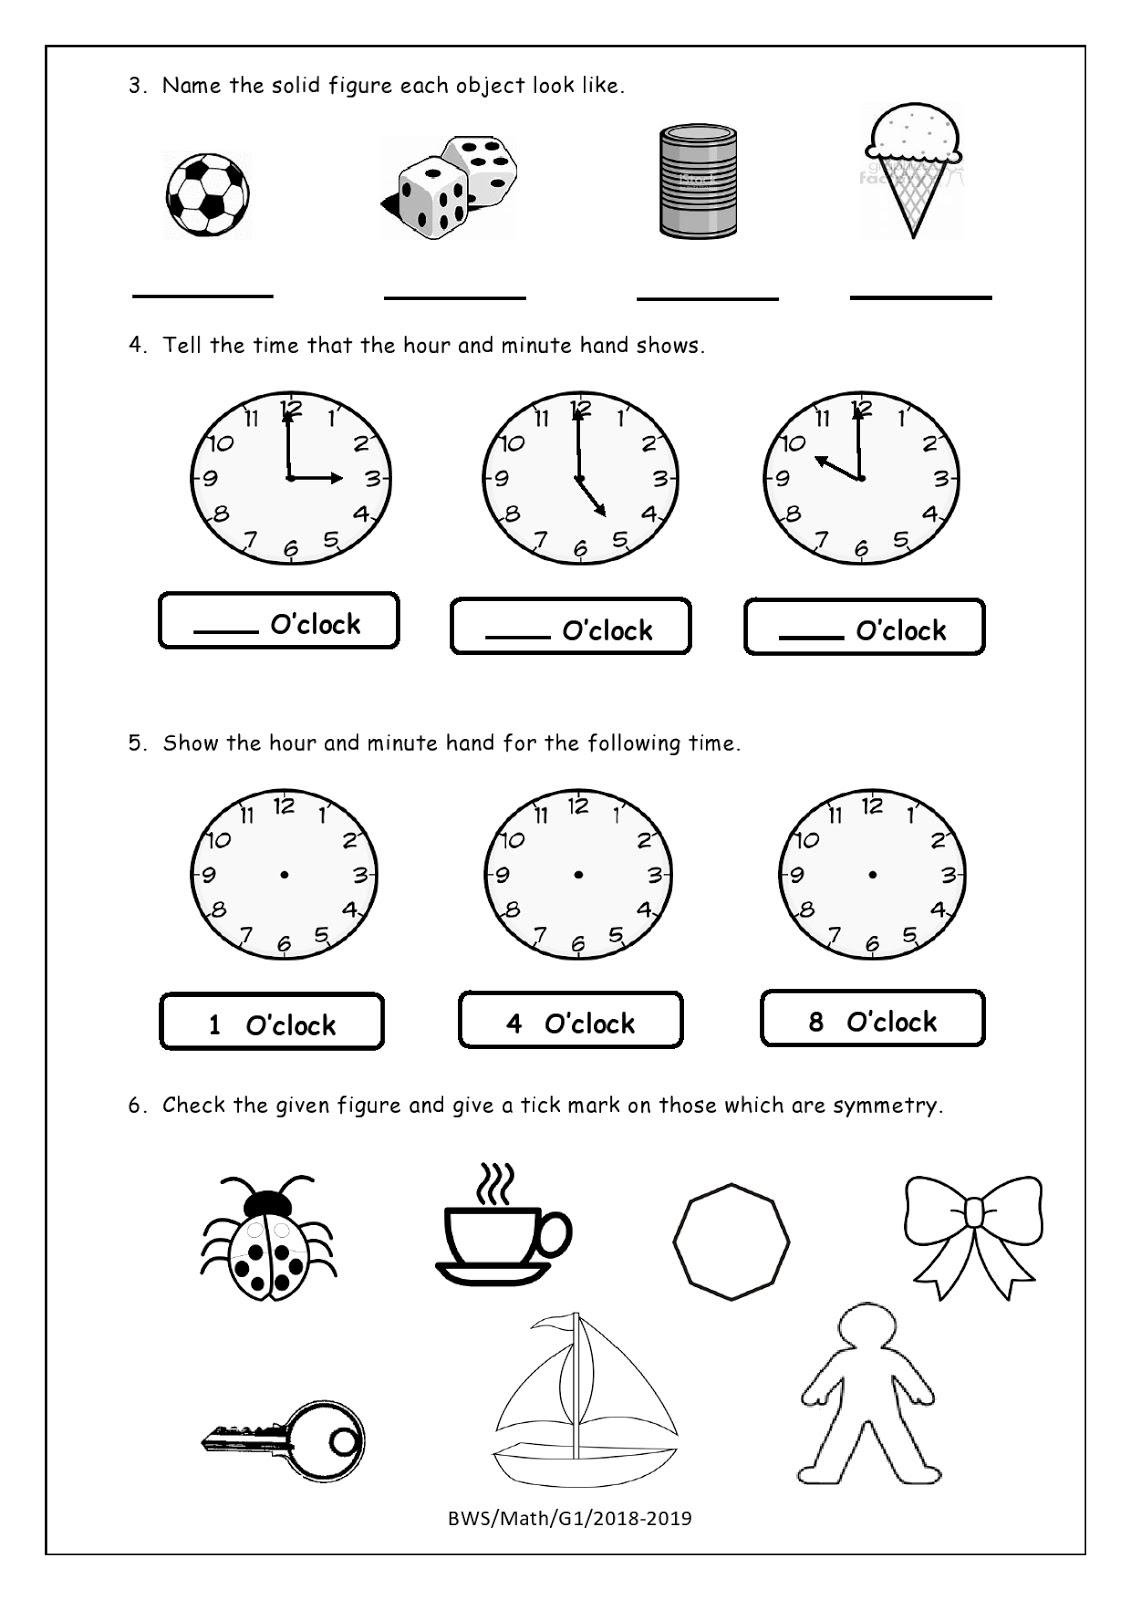 Birla World School Oman Homework For Grade 1 As On 23 04